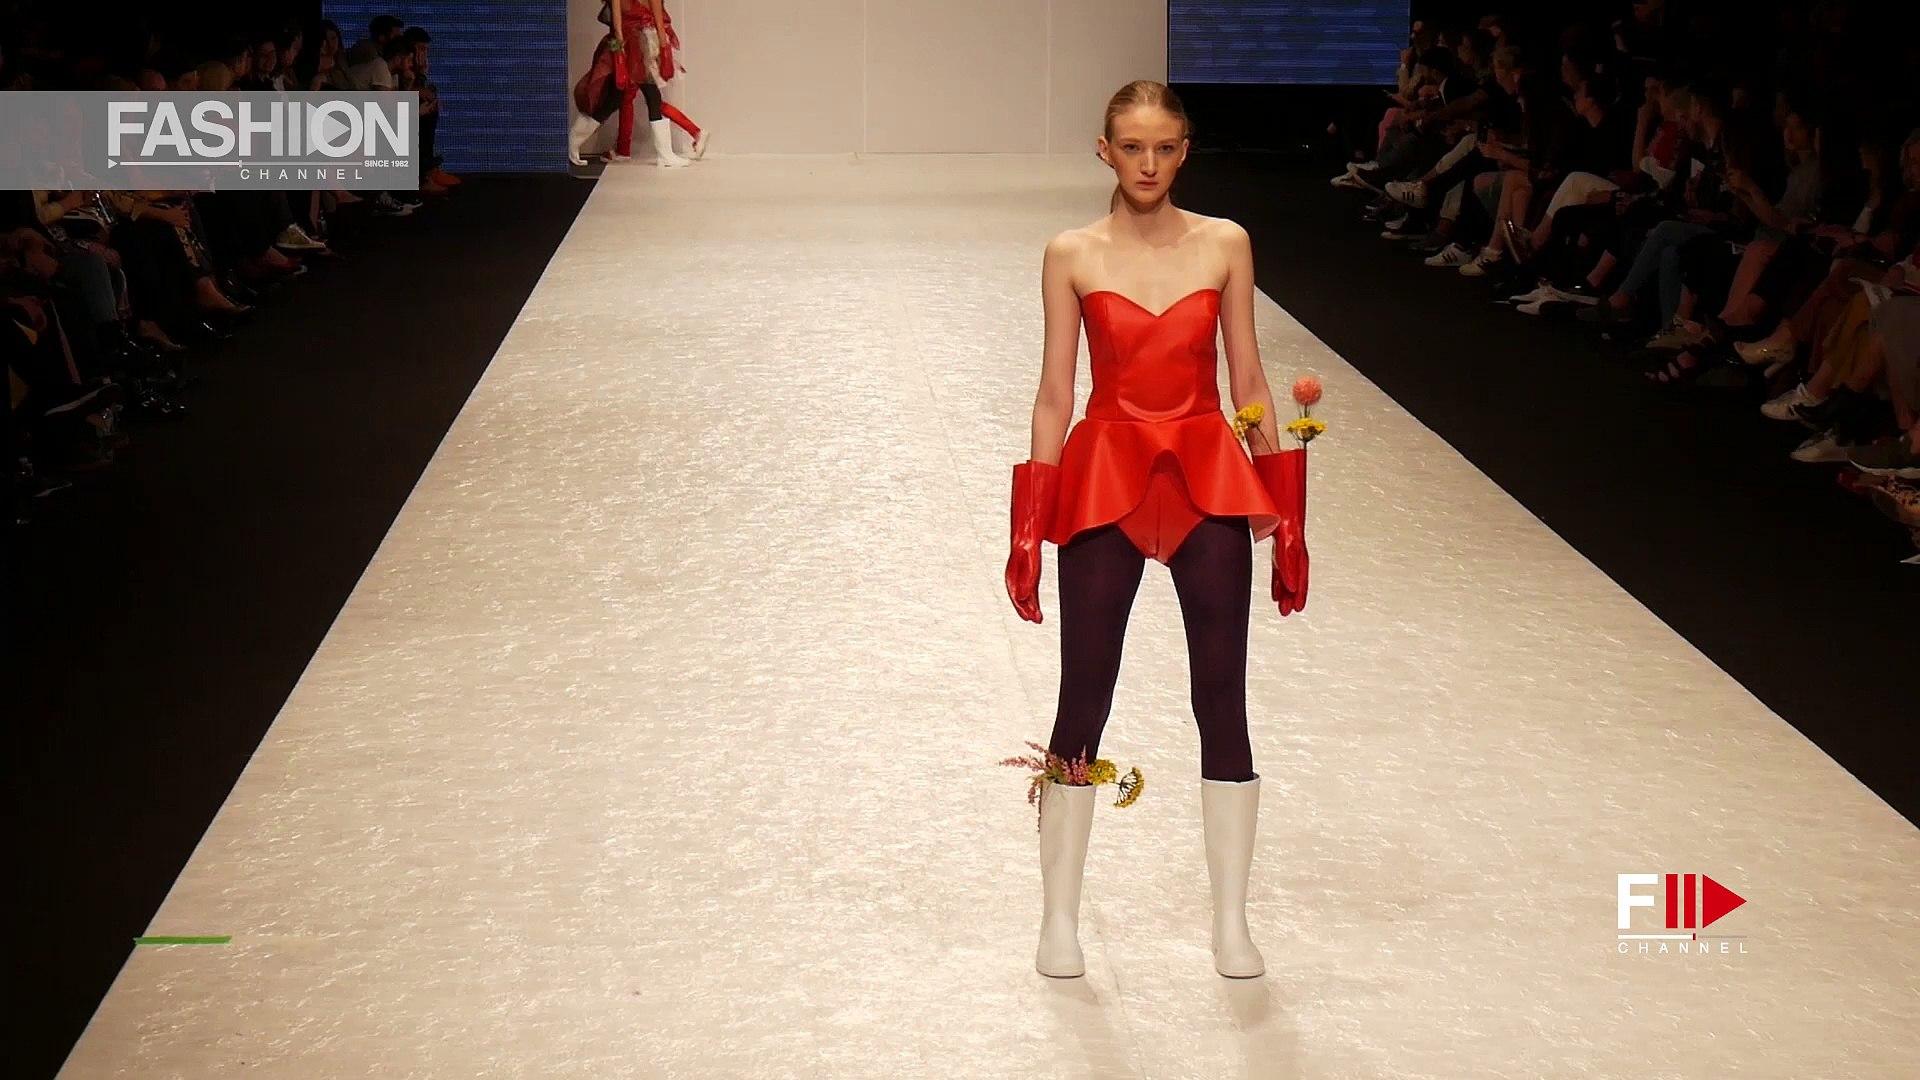 FASHION SCOUT Highlights Belgrade Fashion Week Fall 2018 2019 - Fashion Channel